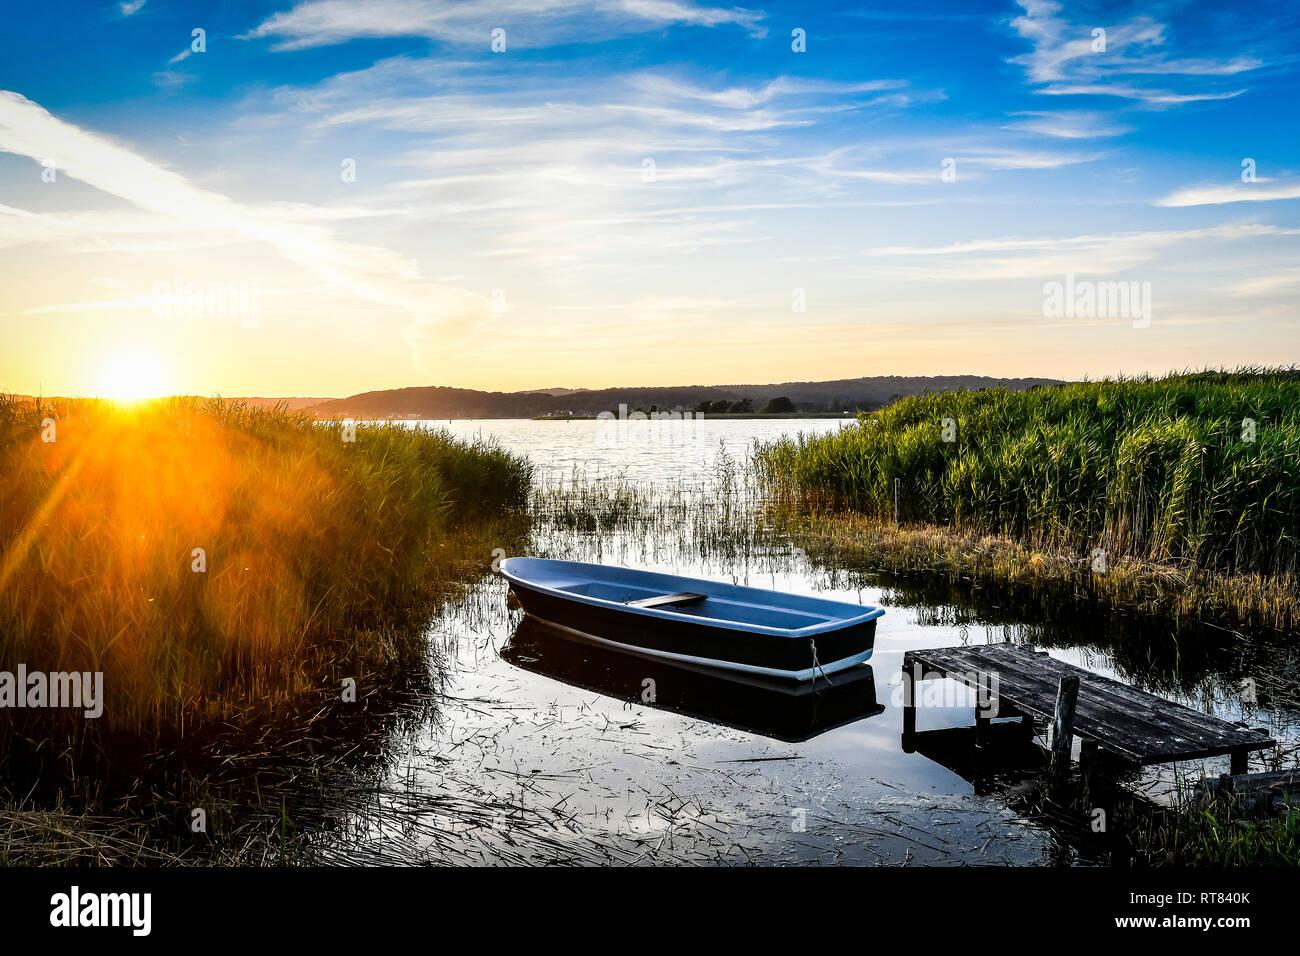 Germany, Mecklenburg-Western Pomerania, Ruegen, Sellin, empty rowing boat near jetty at sunset Stock Photo